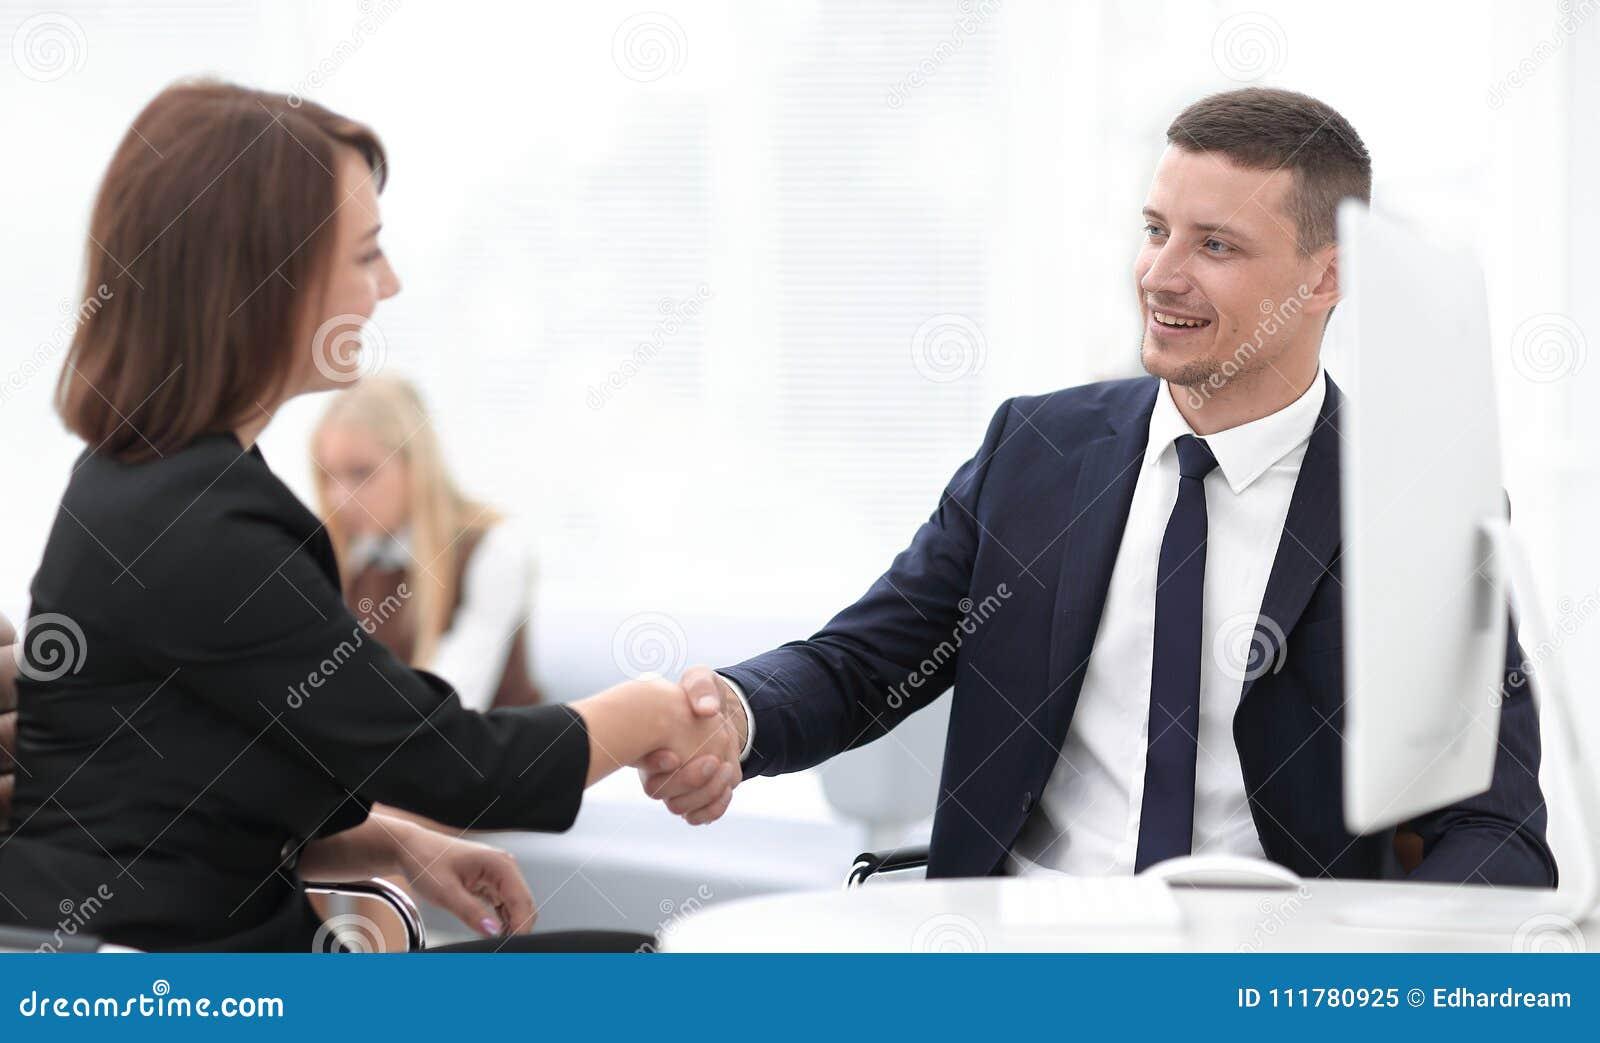 Closeup of a business handshake women business partner.the business concept.